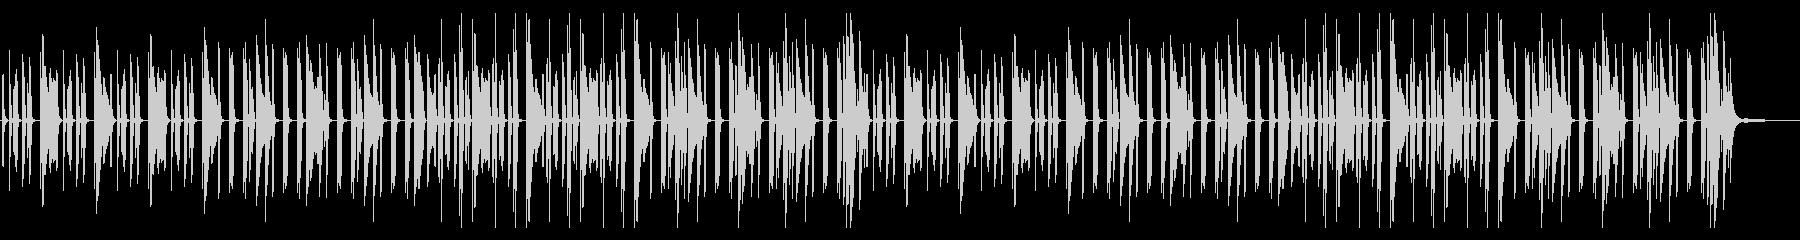 YouTube ピアノソロ・日常・料理の未再生の波形